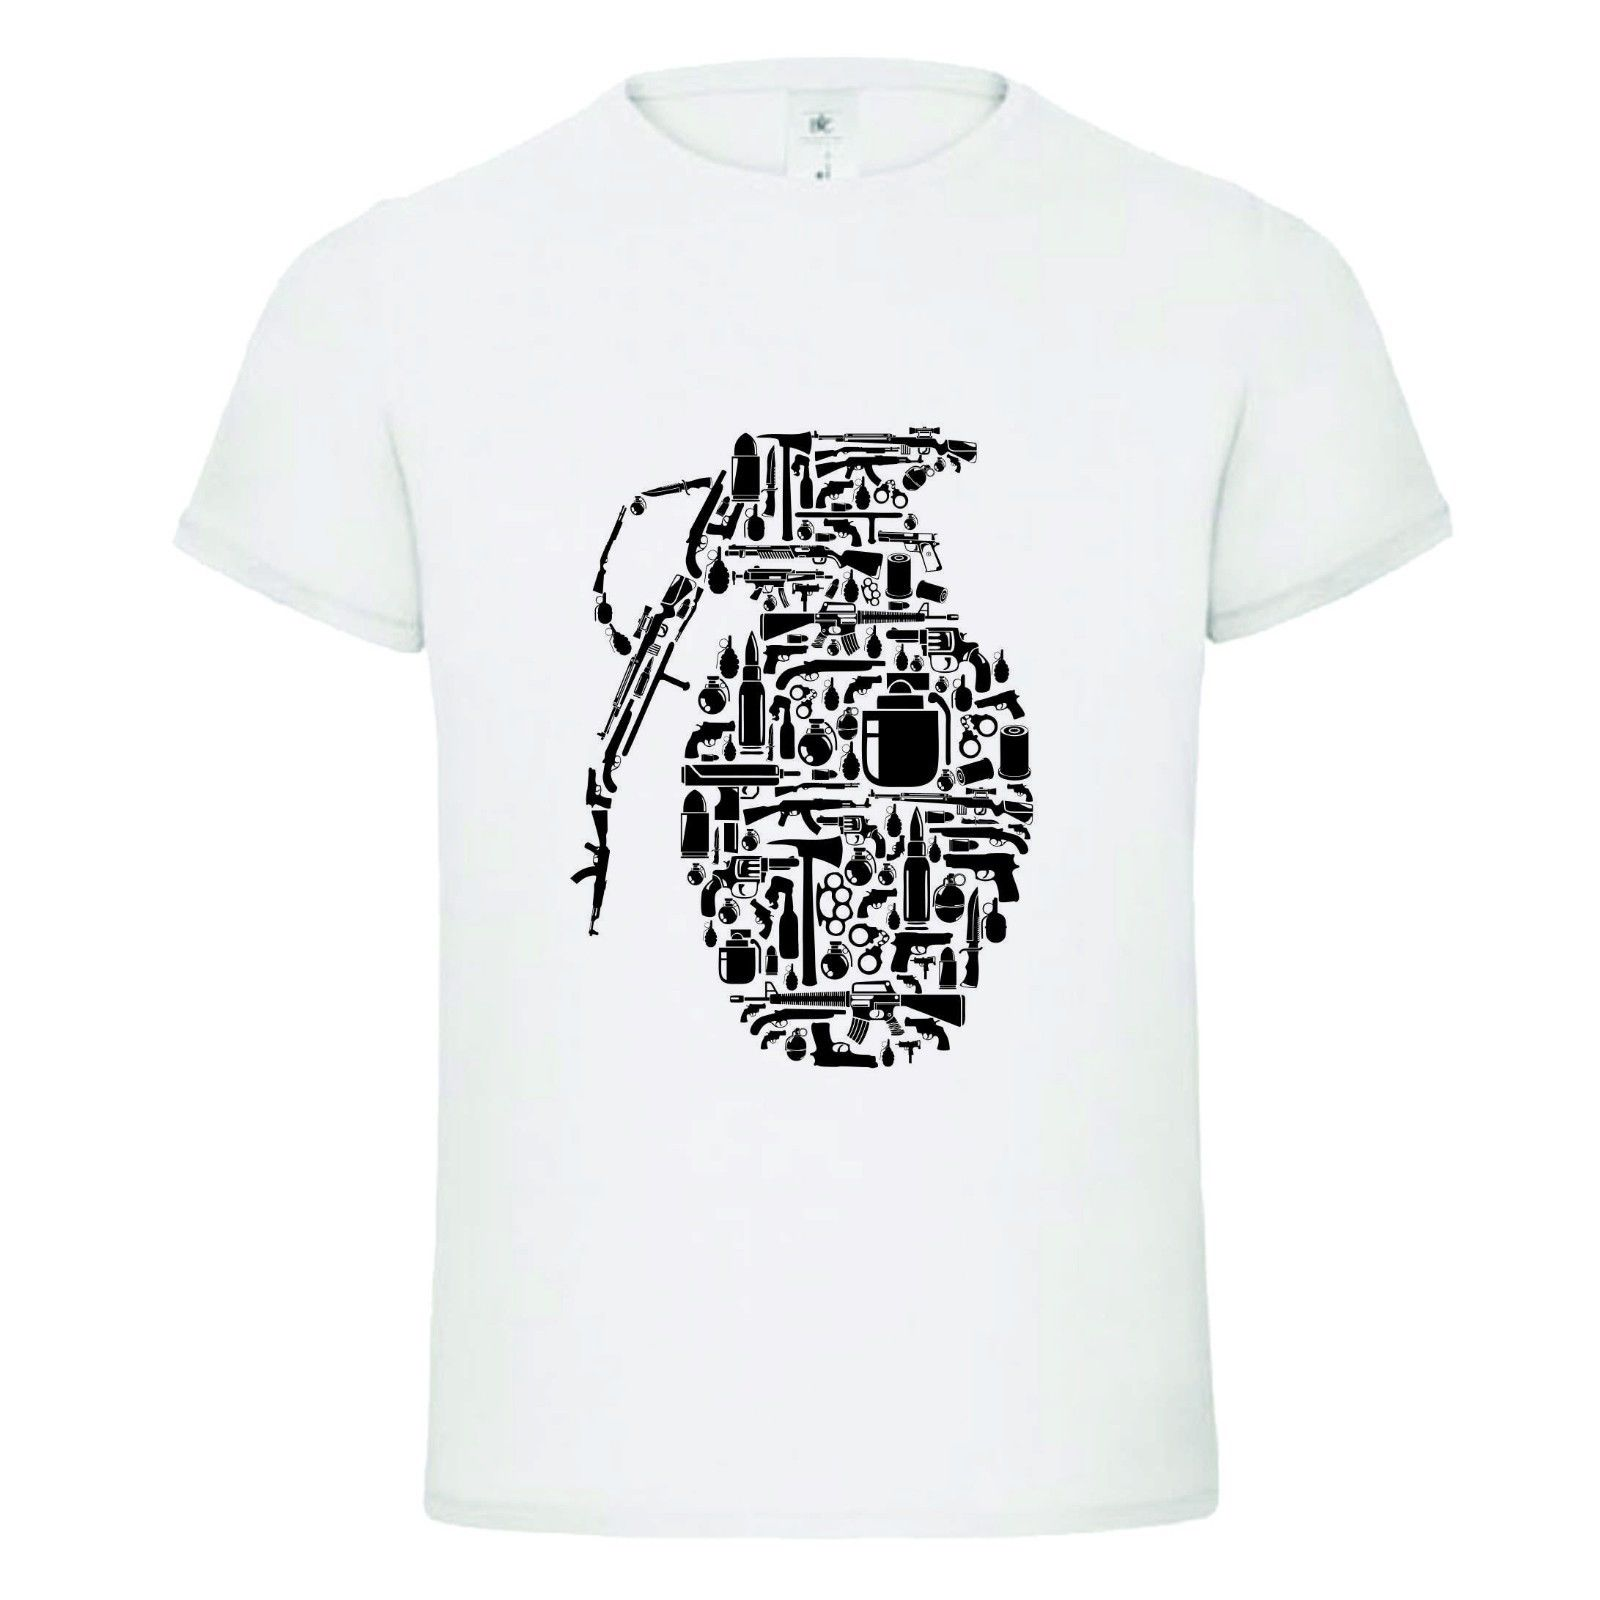 BOMB EXPLOSIVE SHAPES MASHUP funny mens dtg t shirt teeTop Tee 100% Cotton Humor Men Crewneck Shirts Fashion Classic